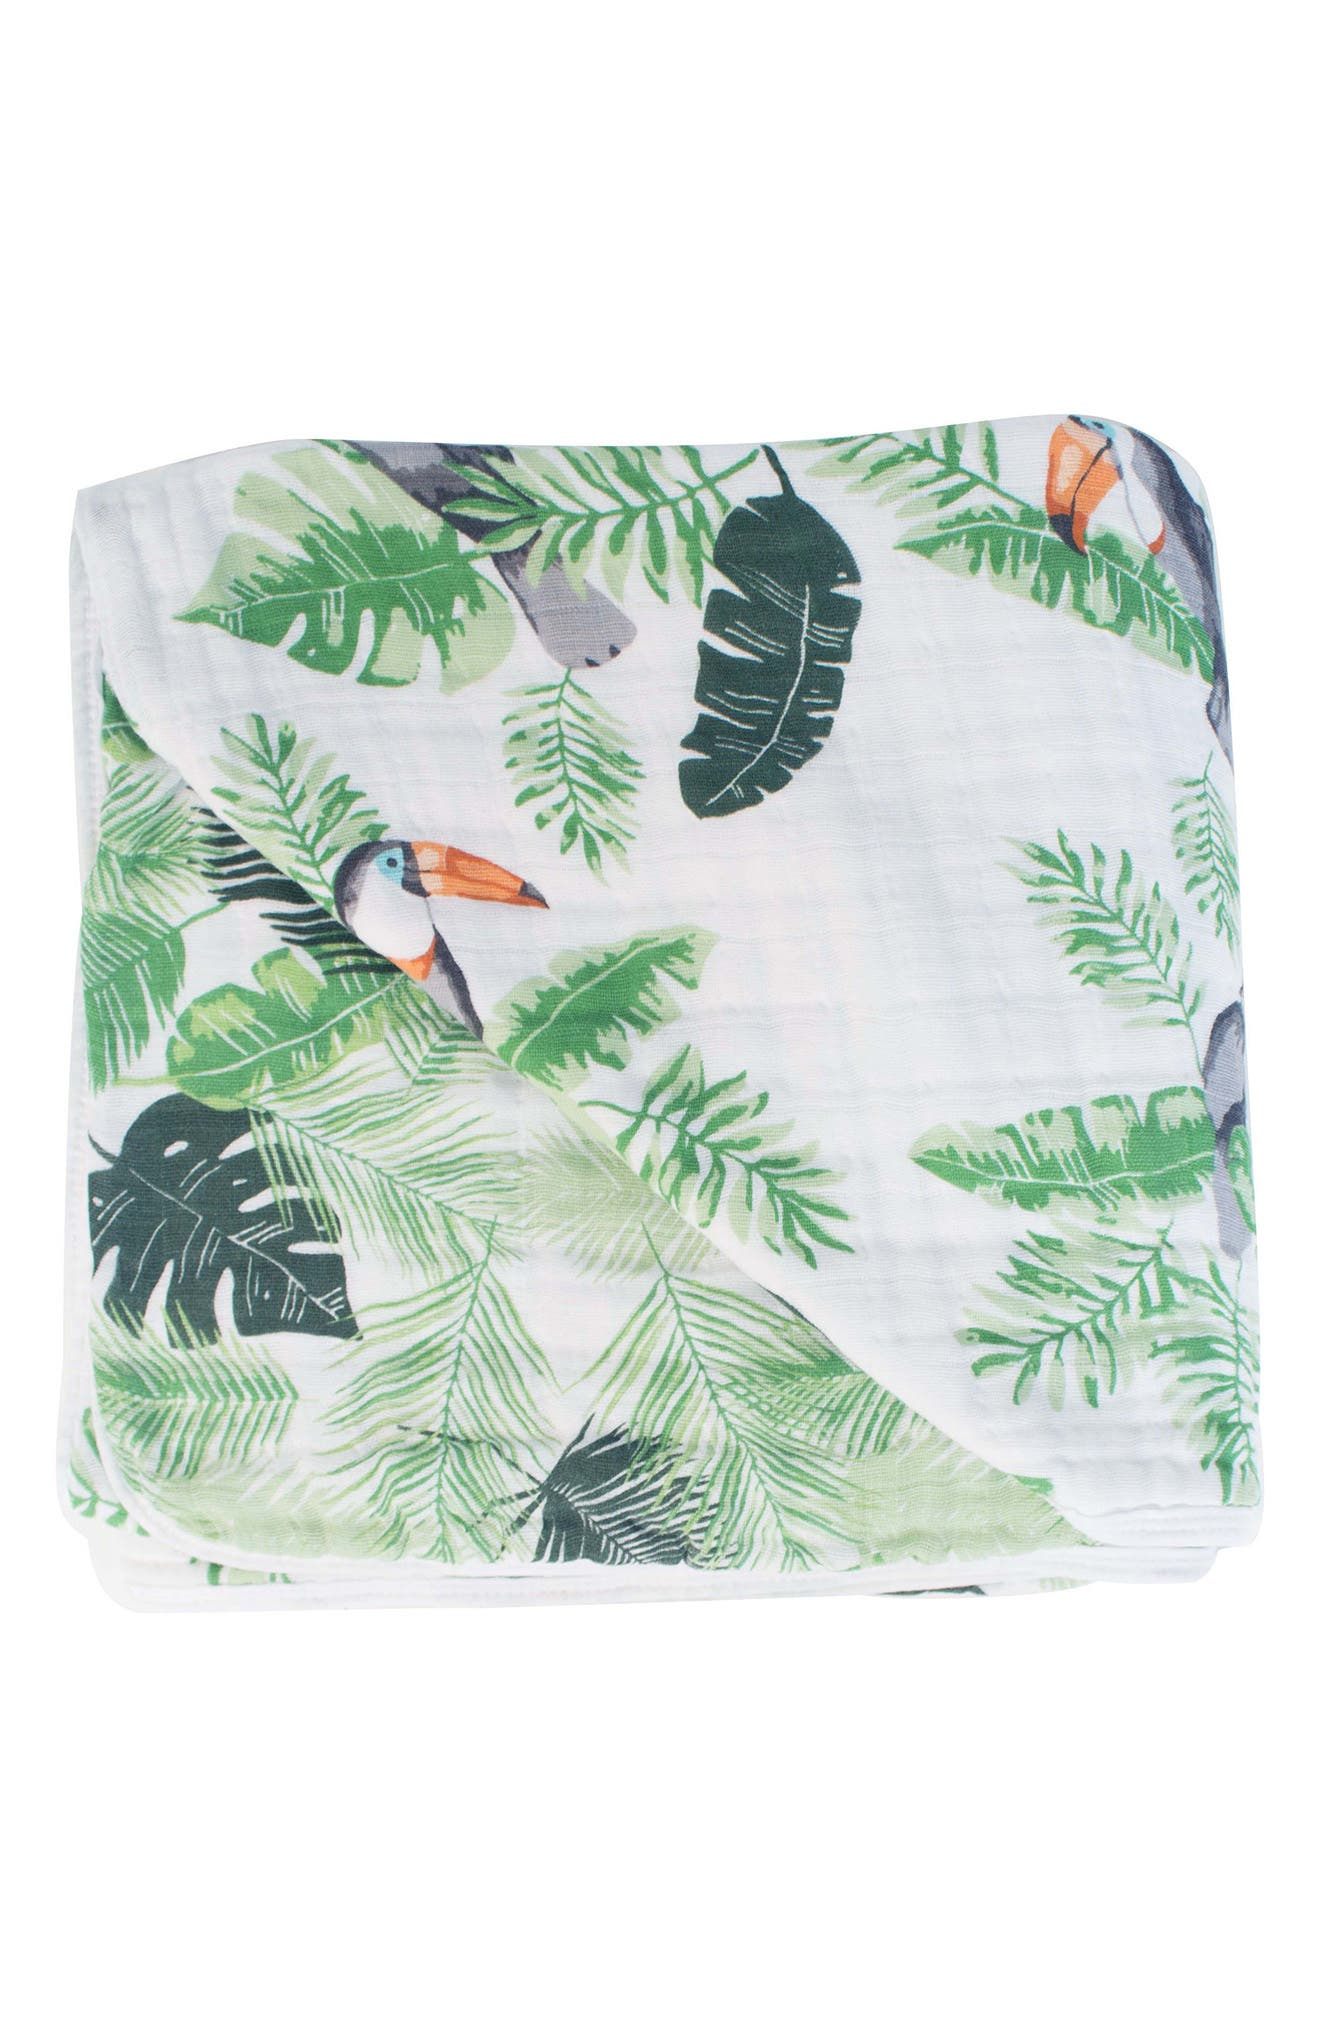 Rio Palms Muslin Snuggle Blanket,                             Main thumbnail 1, color,                             RIO & PALMS